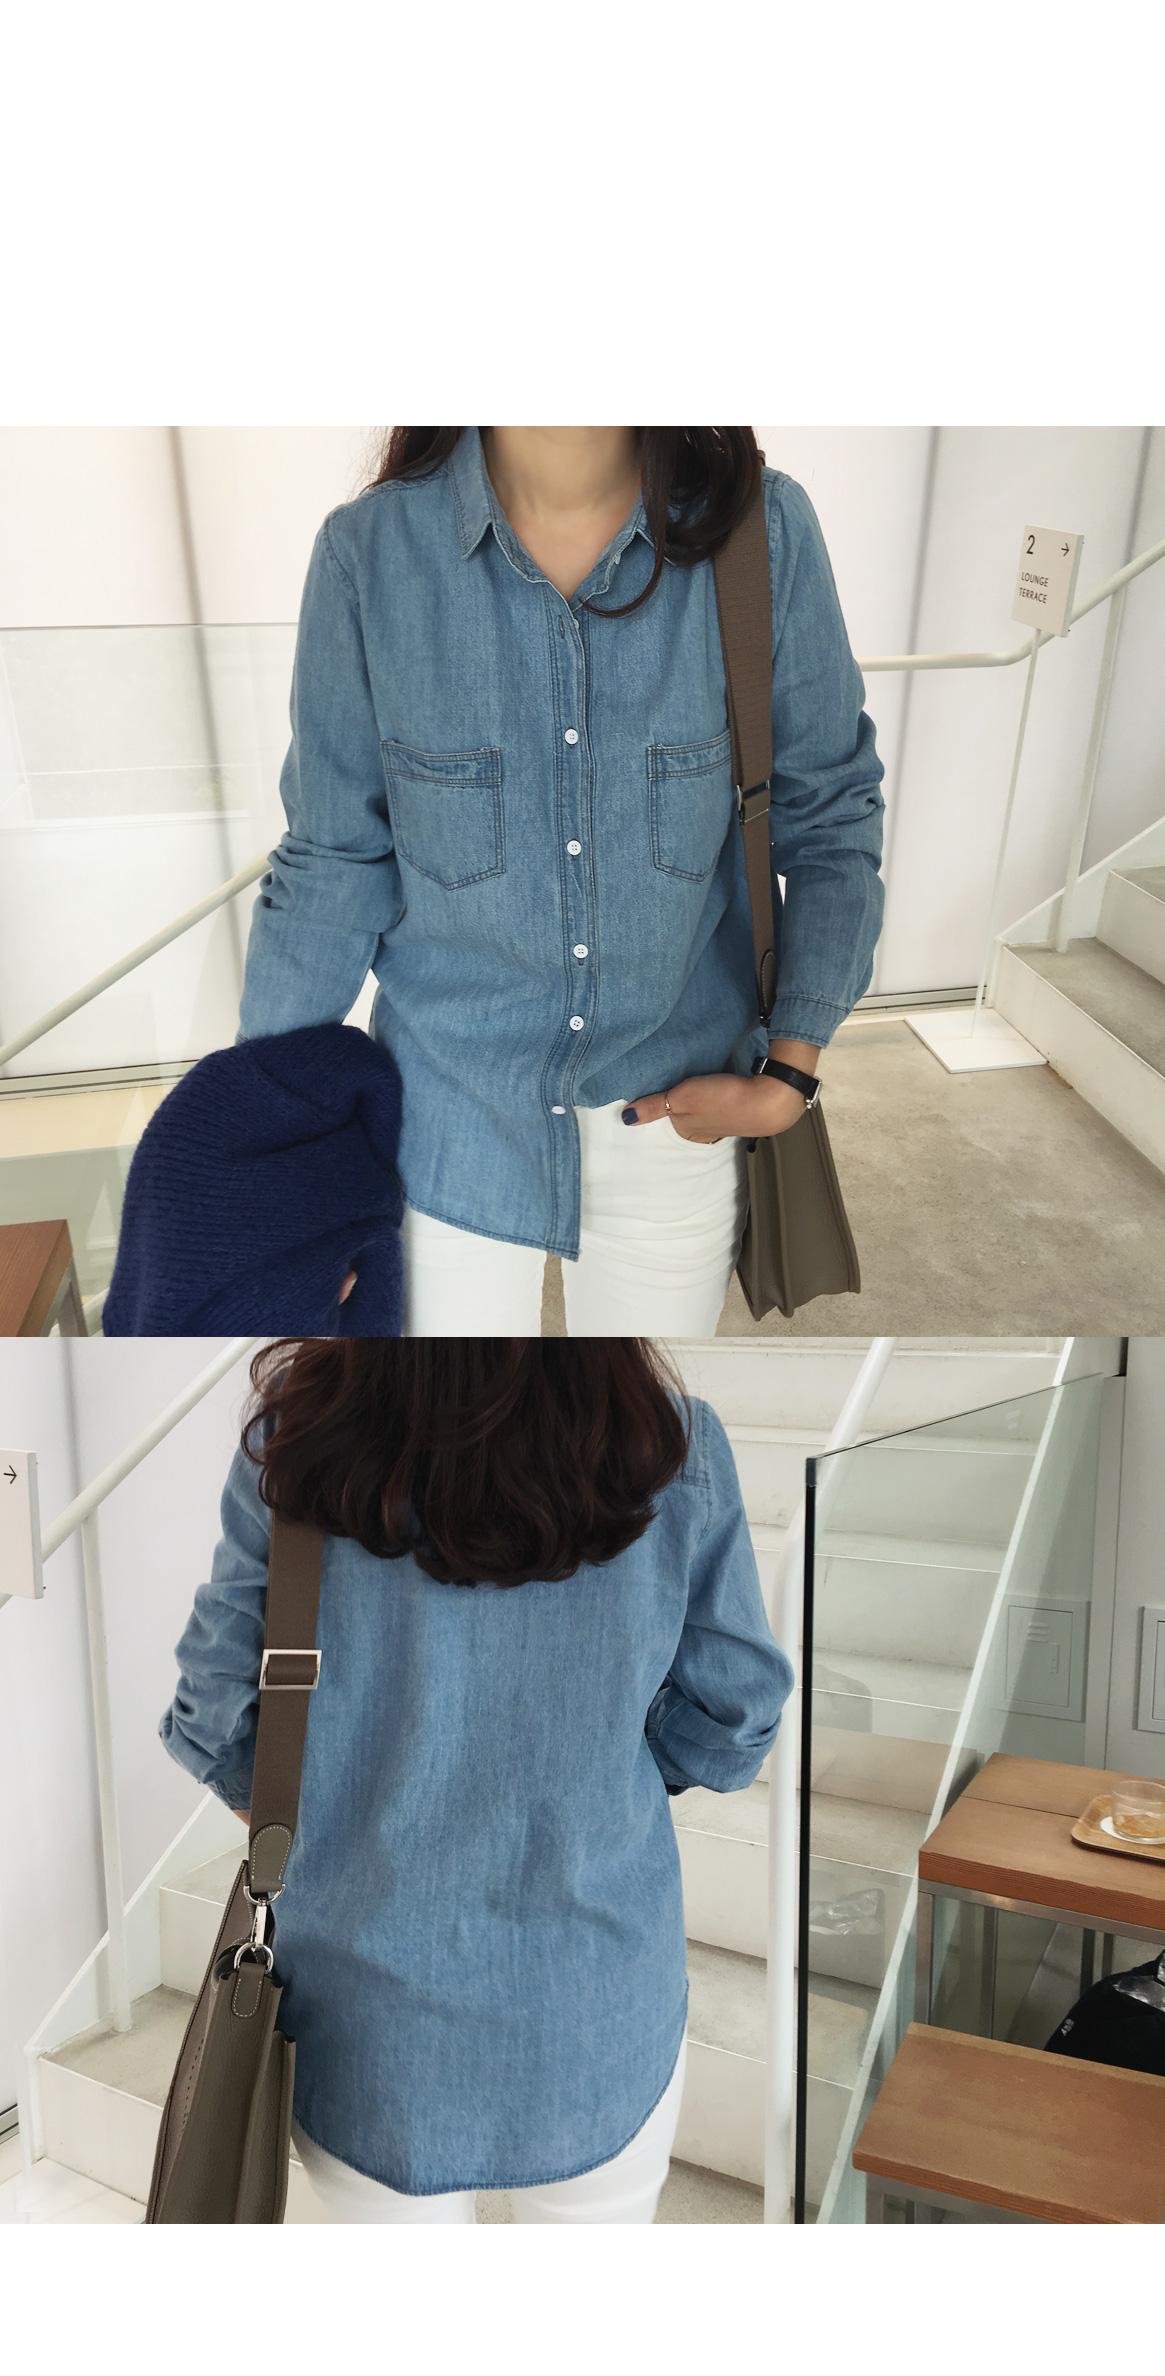 Beautifully clean denim shirt